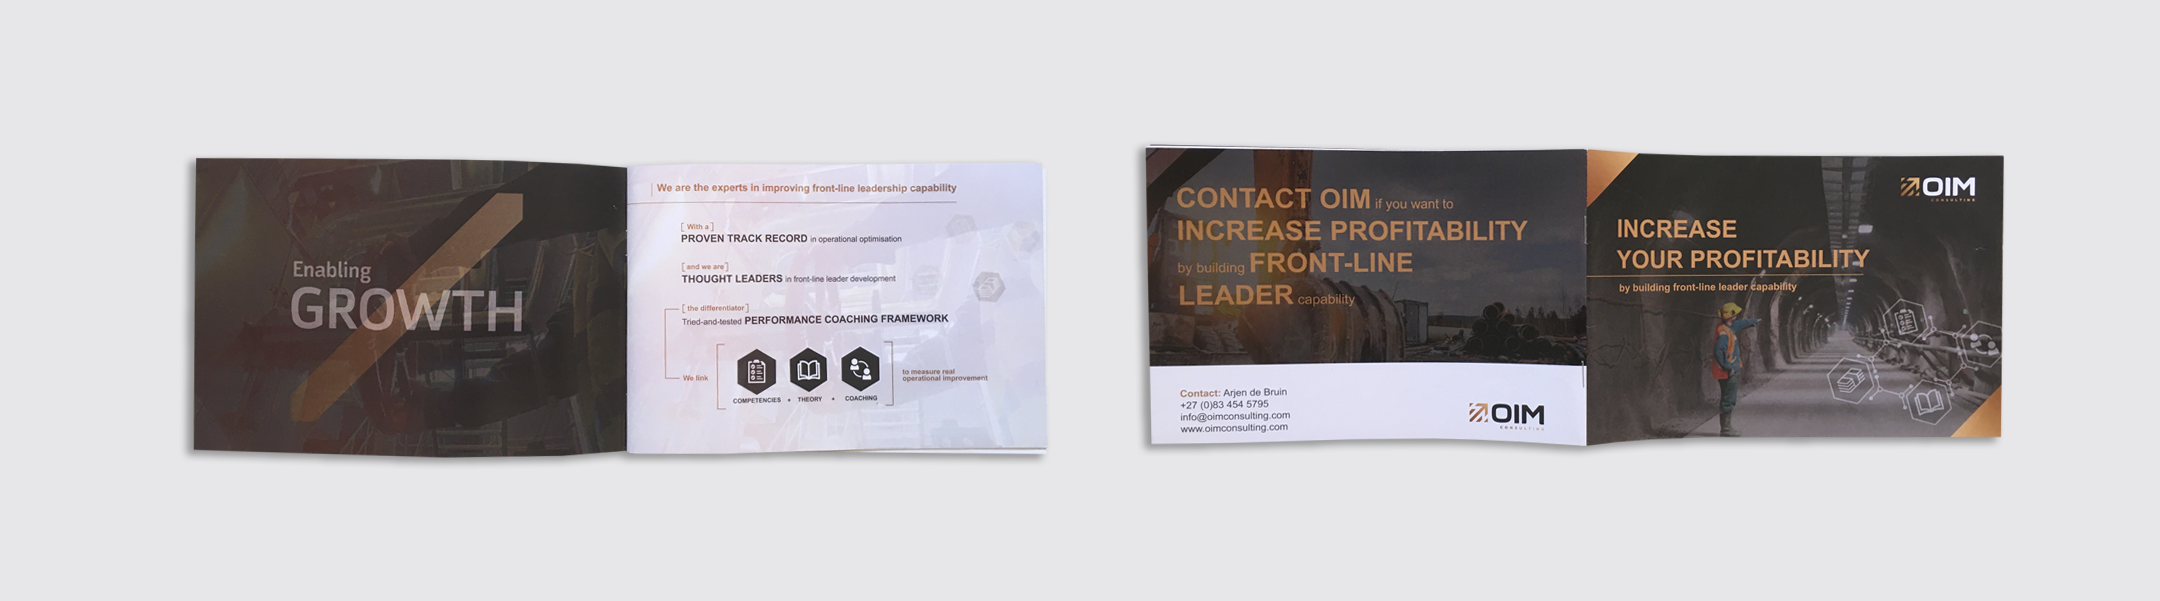 oim increase your profit - OIM